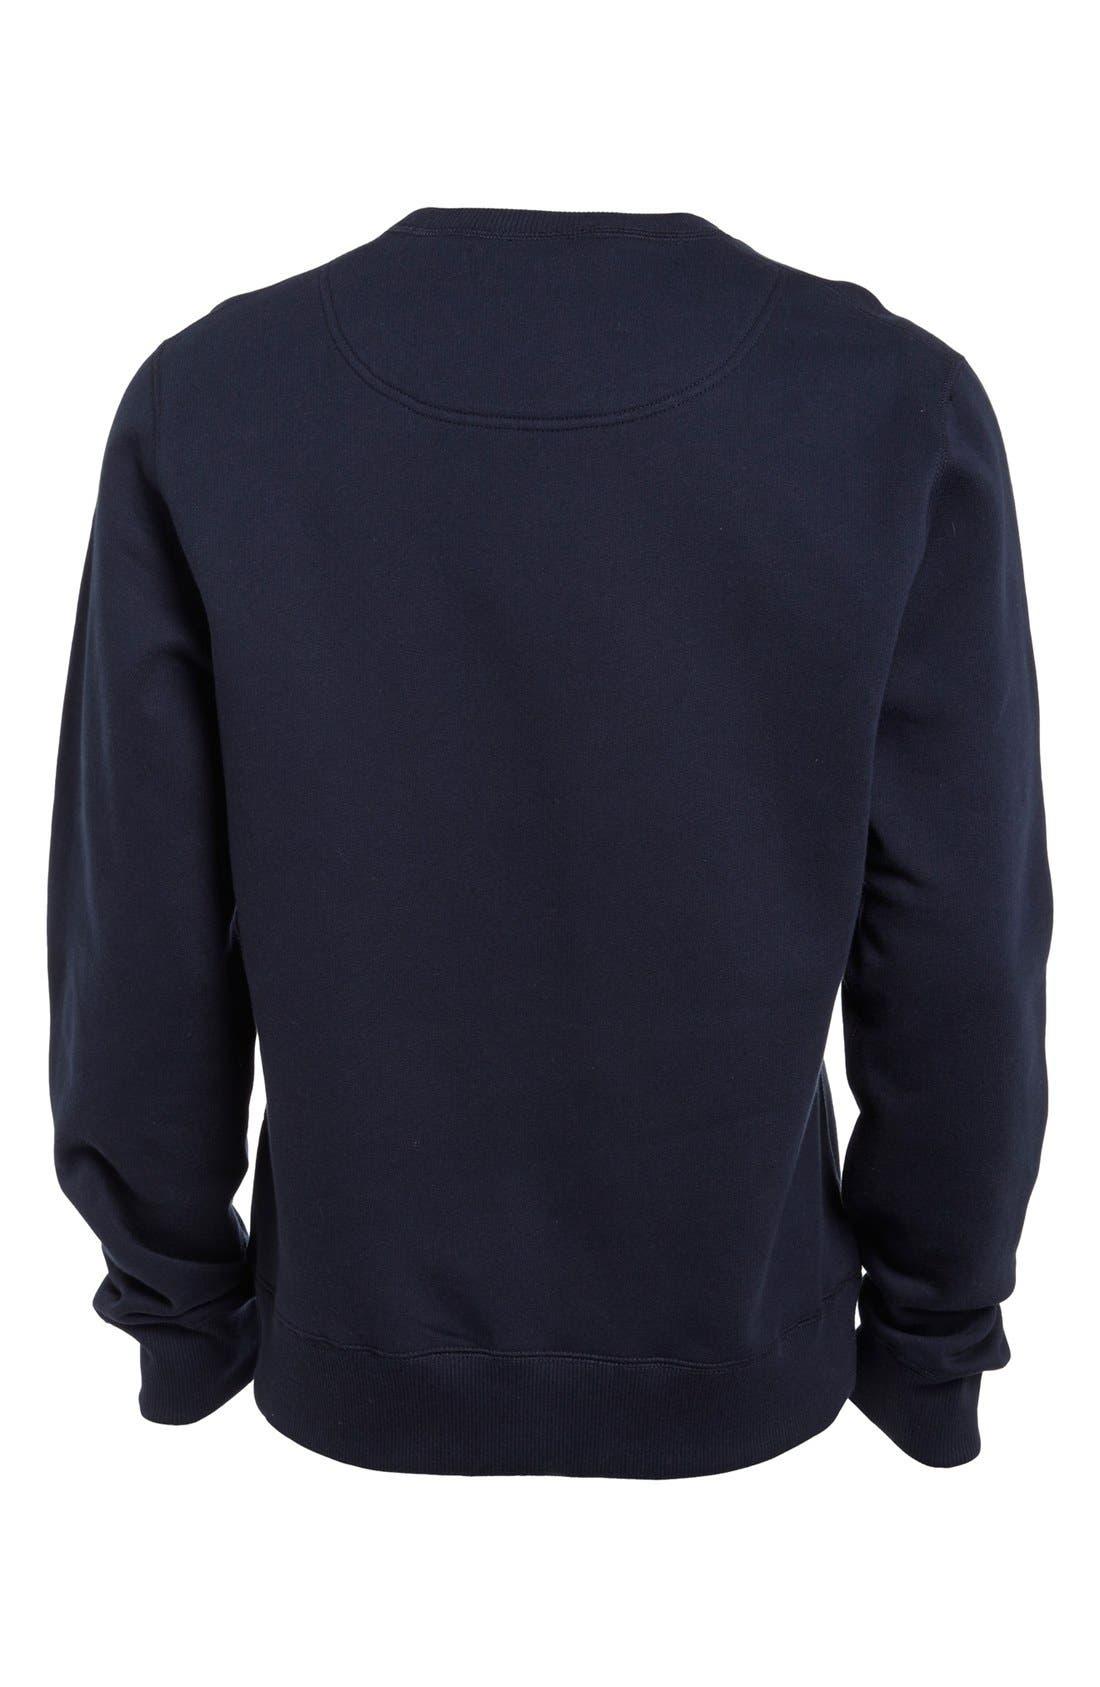 KENZO, Embroidered Tiger Sweatshirt, Alternate thumbnail 3, color, 410